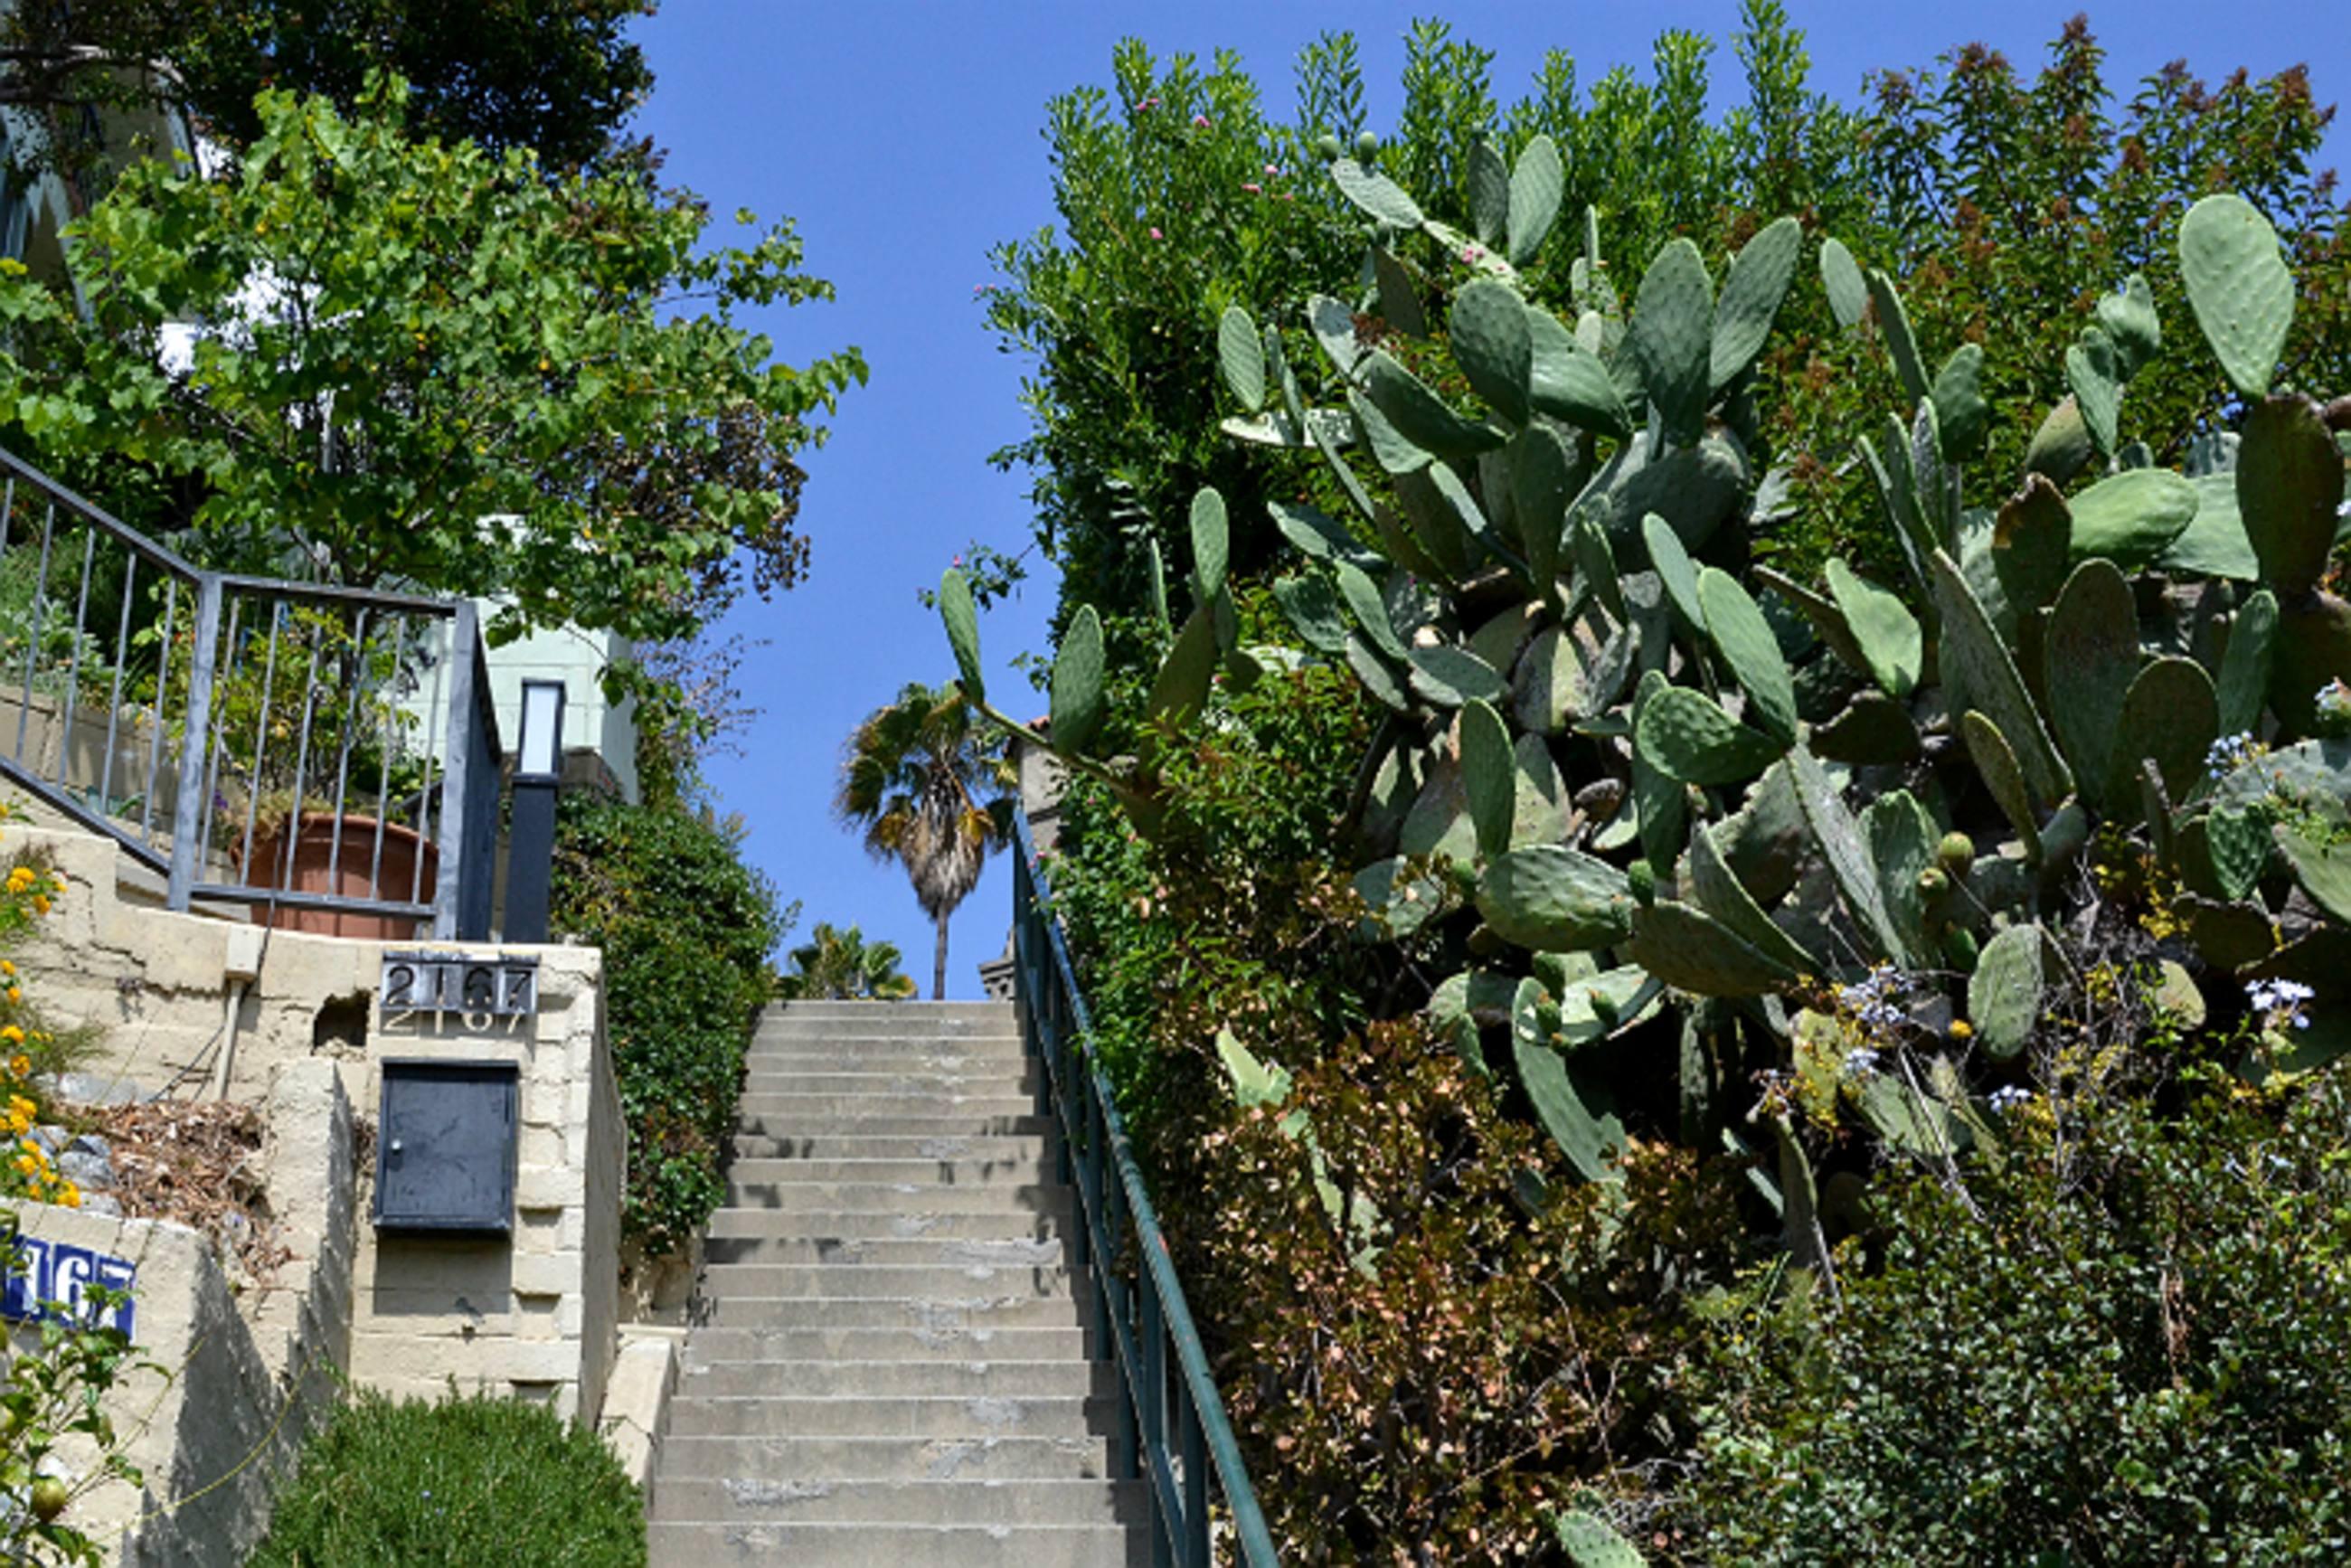 Broadview Terrace Stairs|Photo: Joshua Lurie